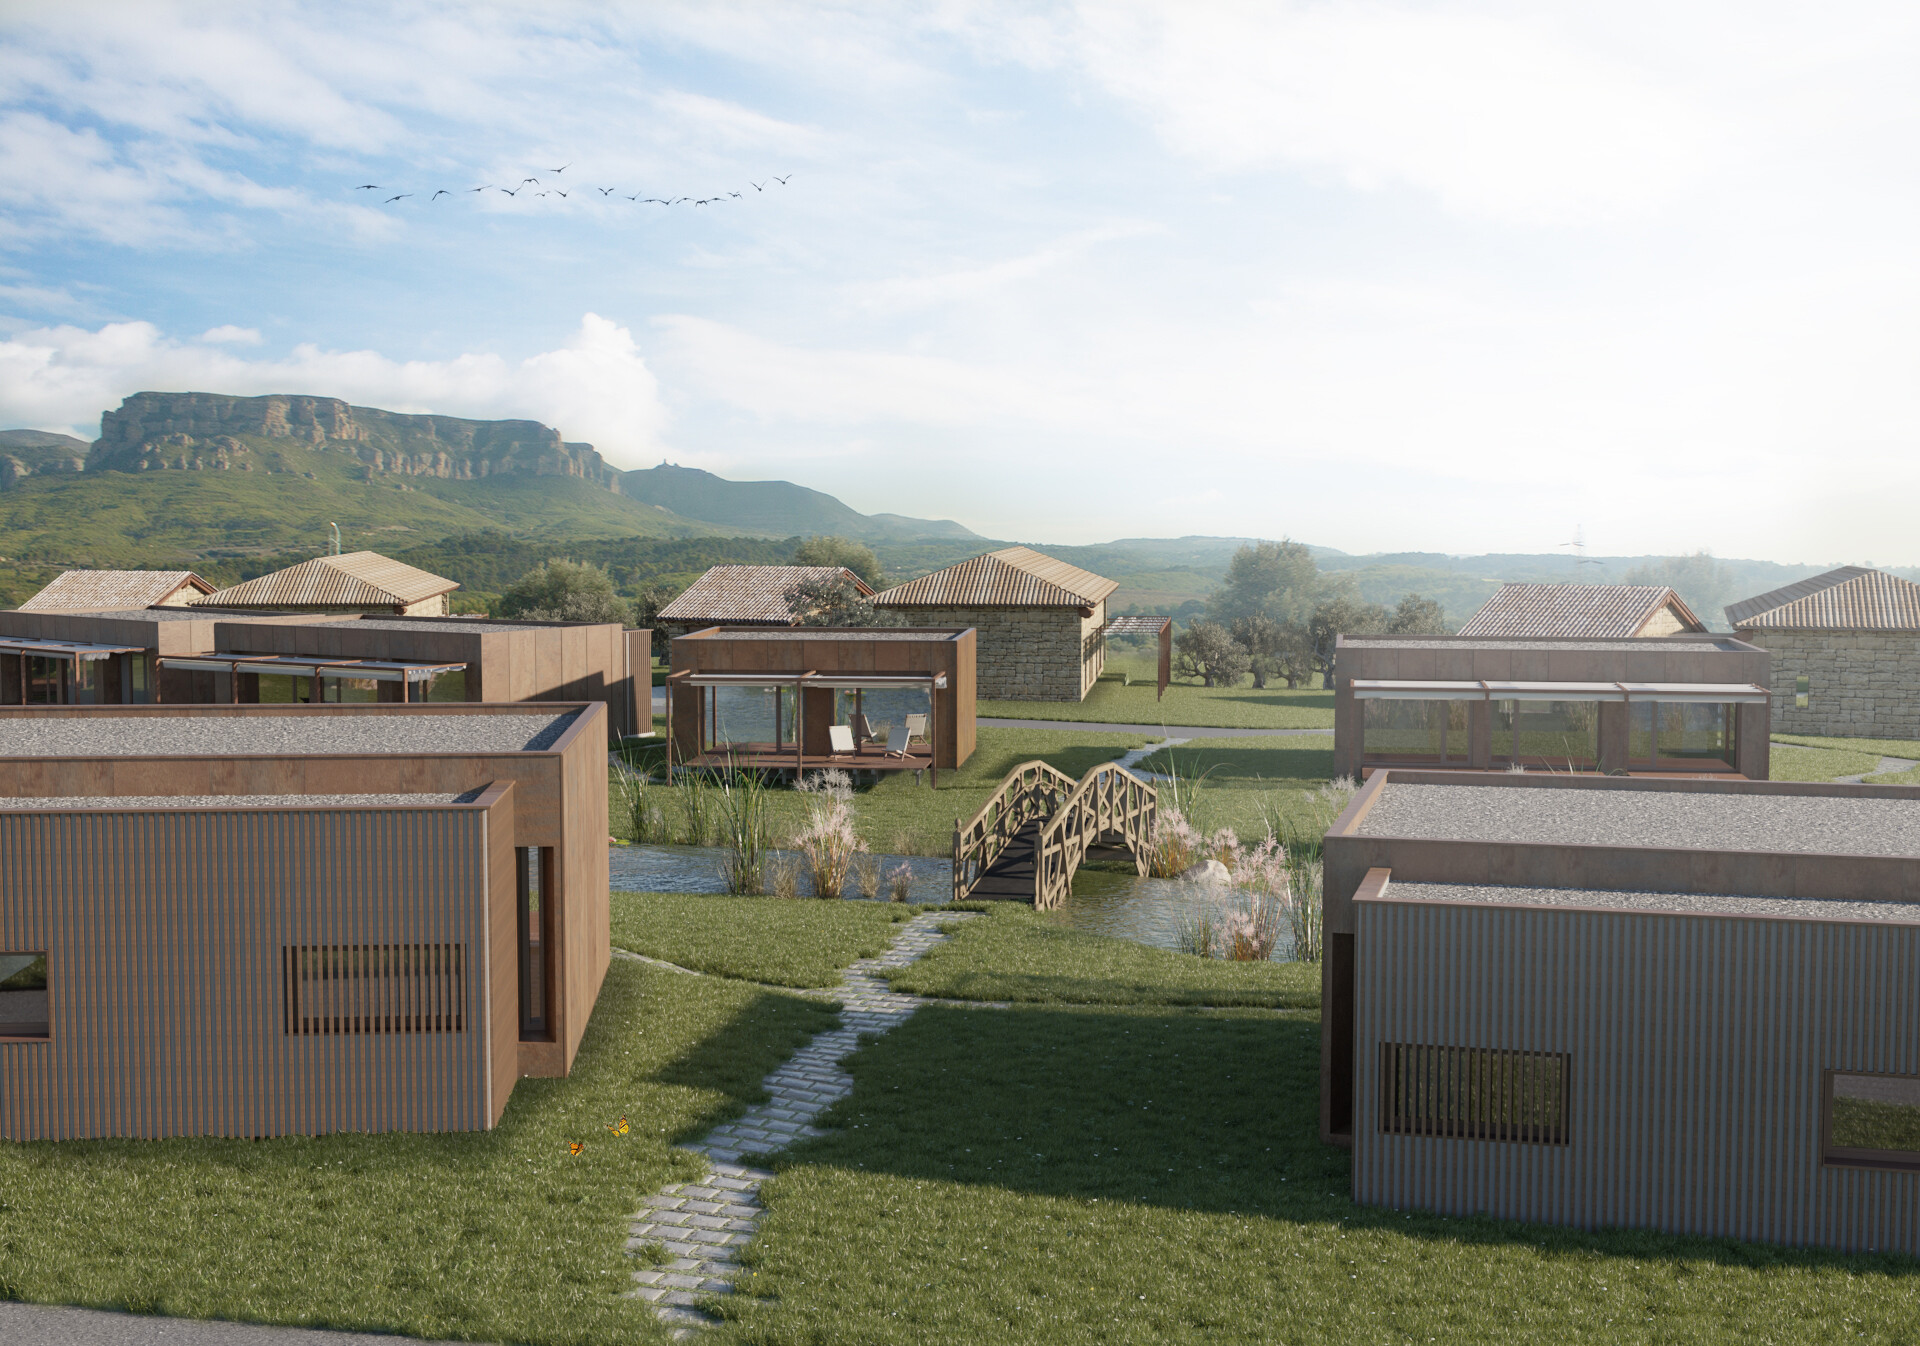 Baboon lab vista lago 2 new2